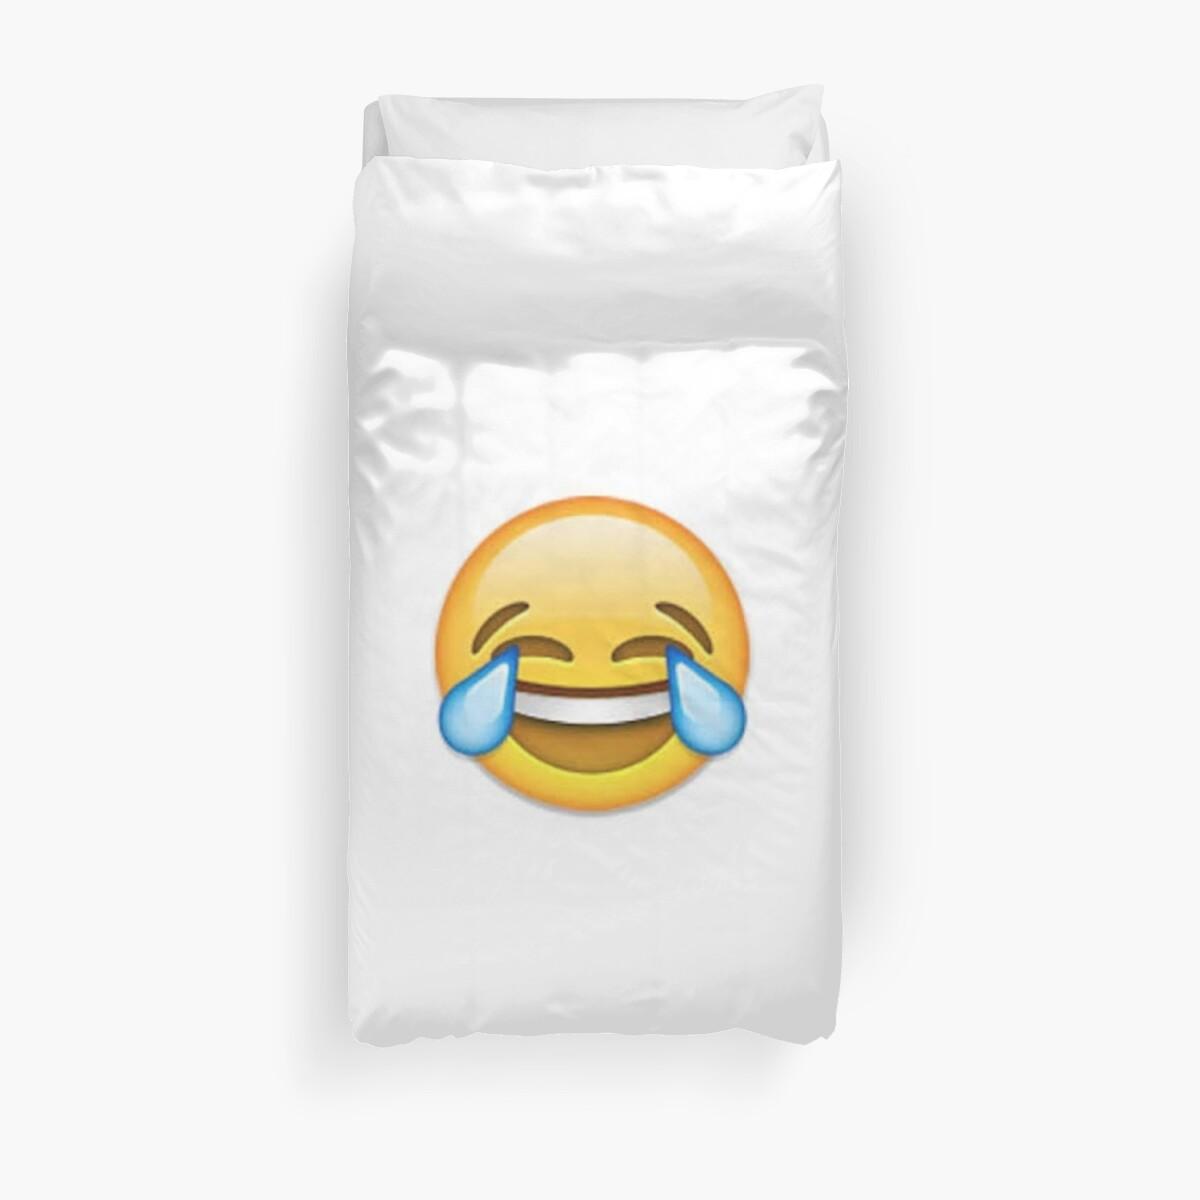 Quot Laughing Emoji Quot Duvet Covers By Janetgonzalez Redbubble